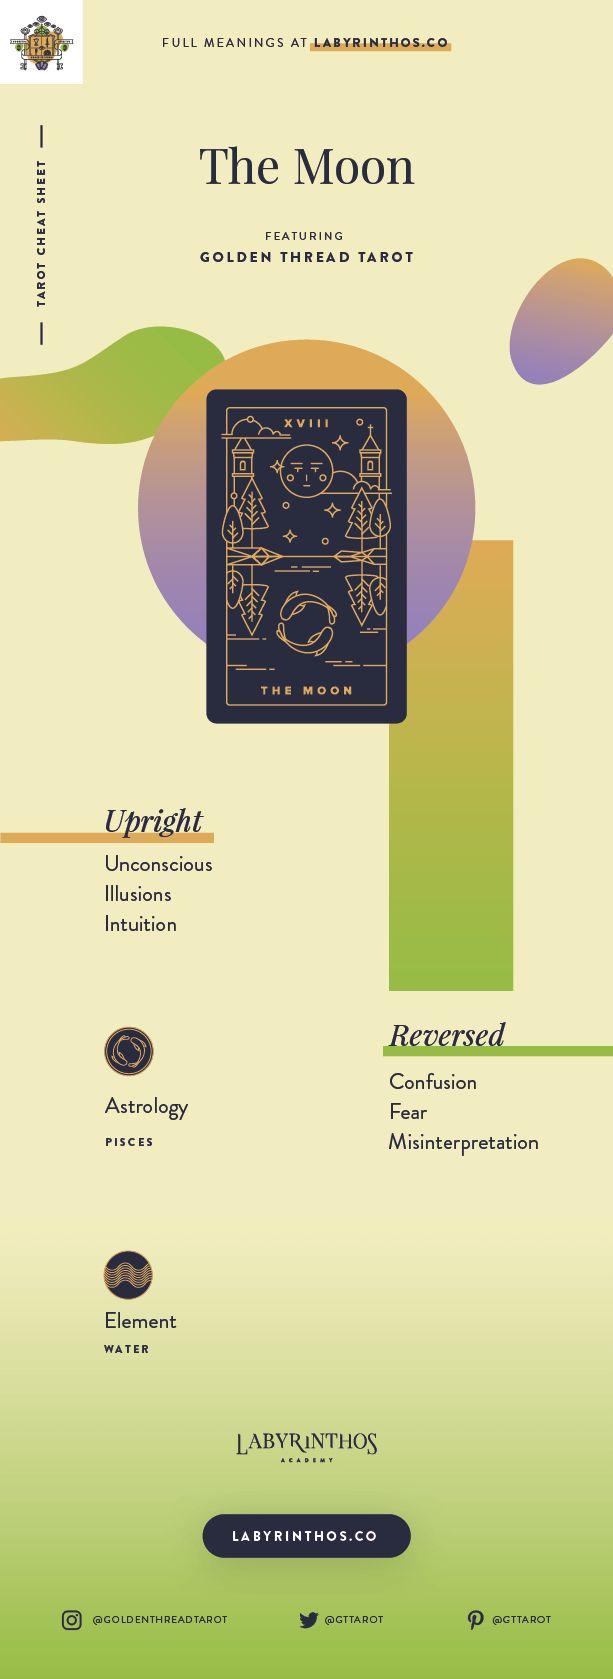 The Moon Meaning - Tarot Card Meanings Cheat Sheet. Art from Golden Thread Tarot.